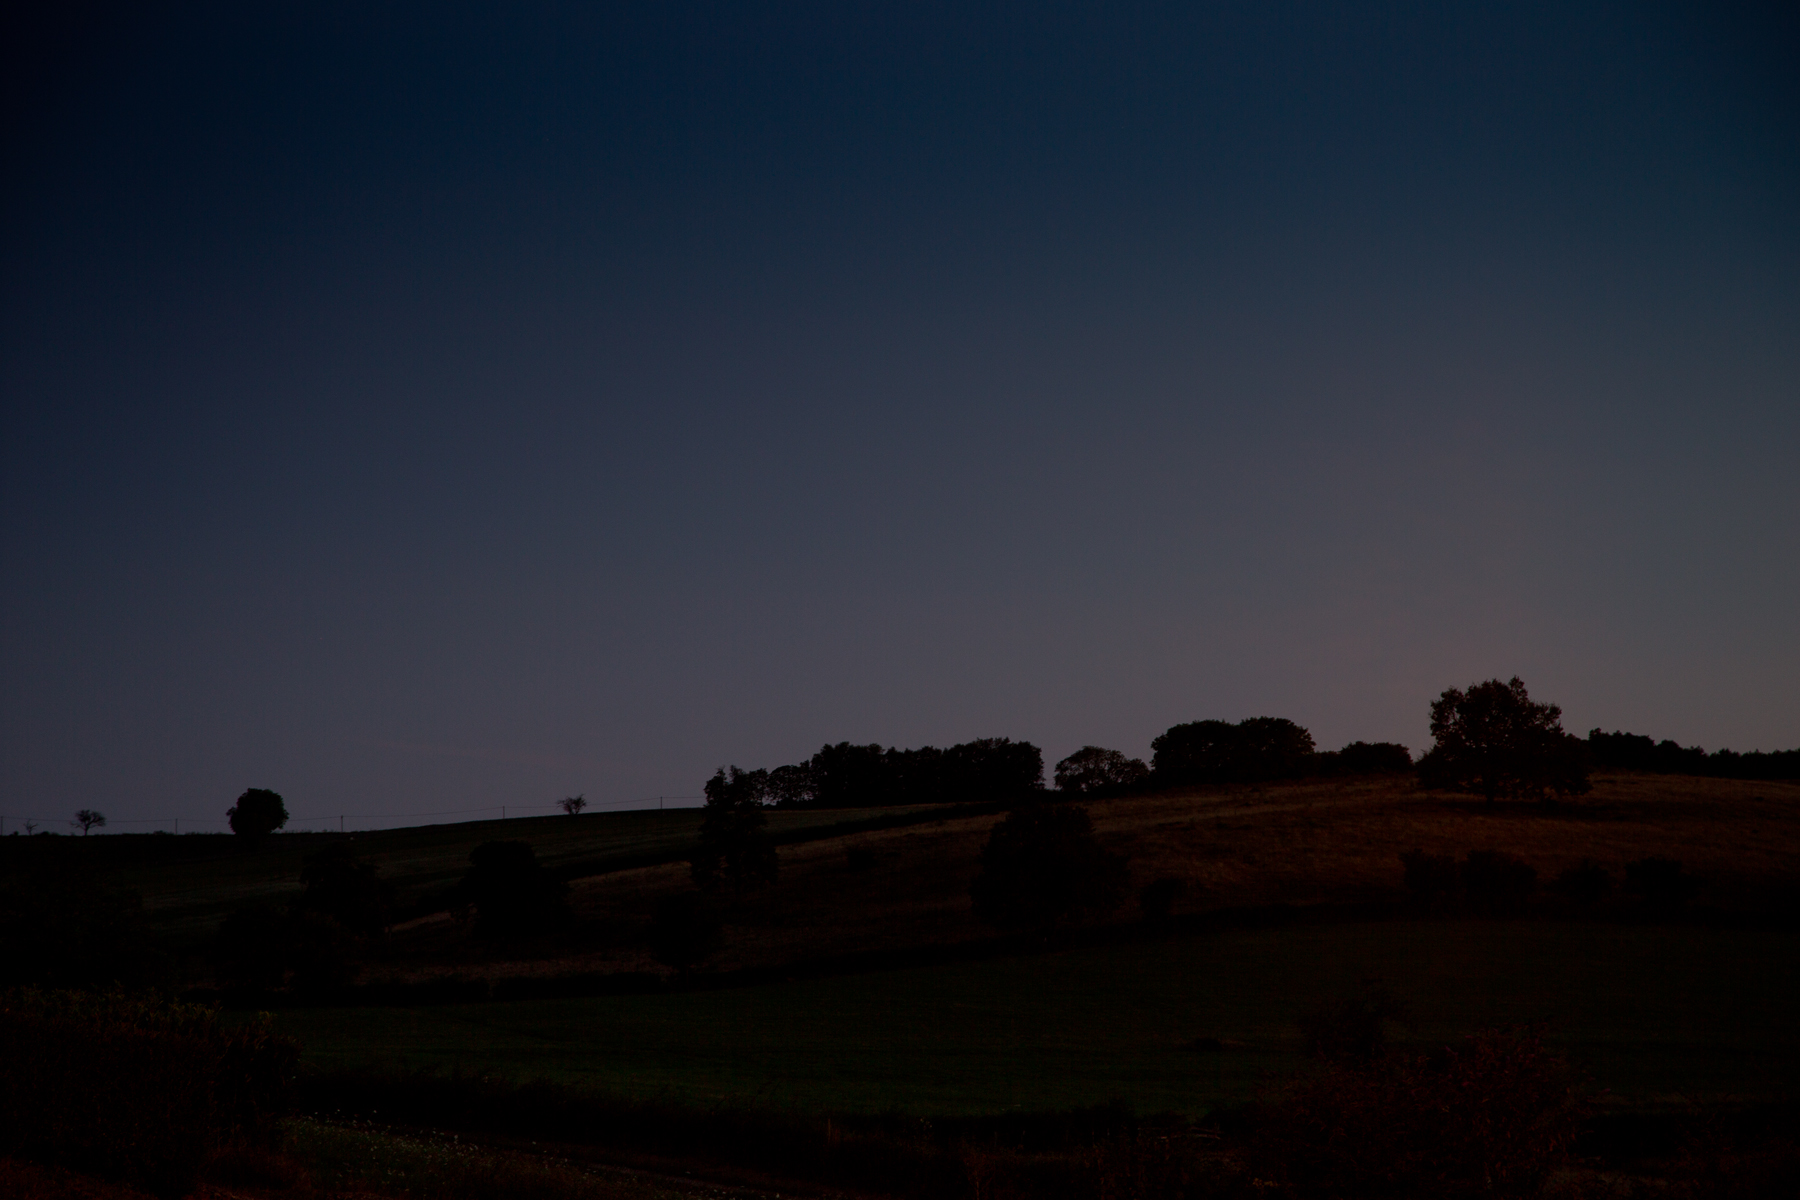 Silhouette Hügel